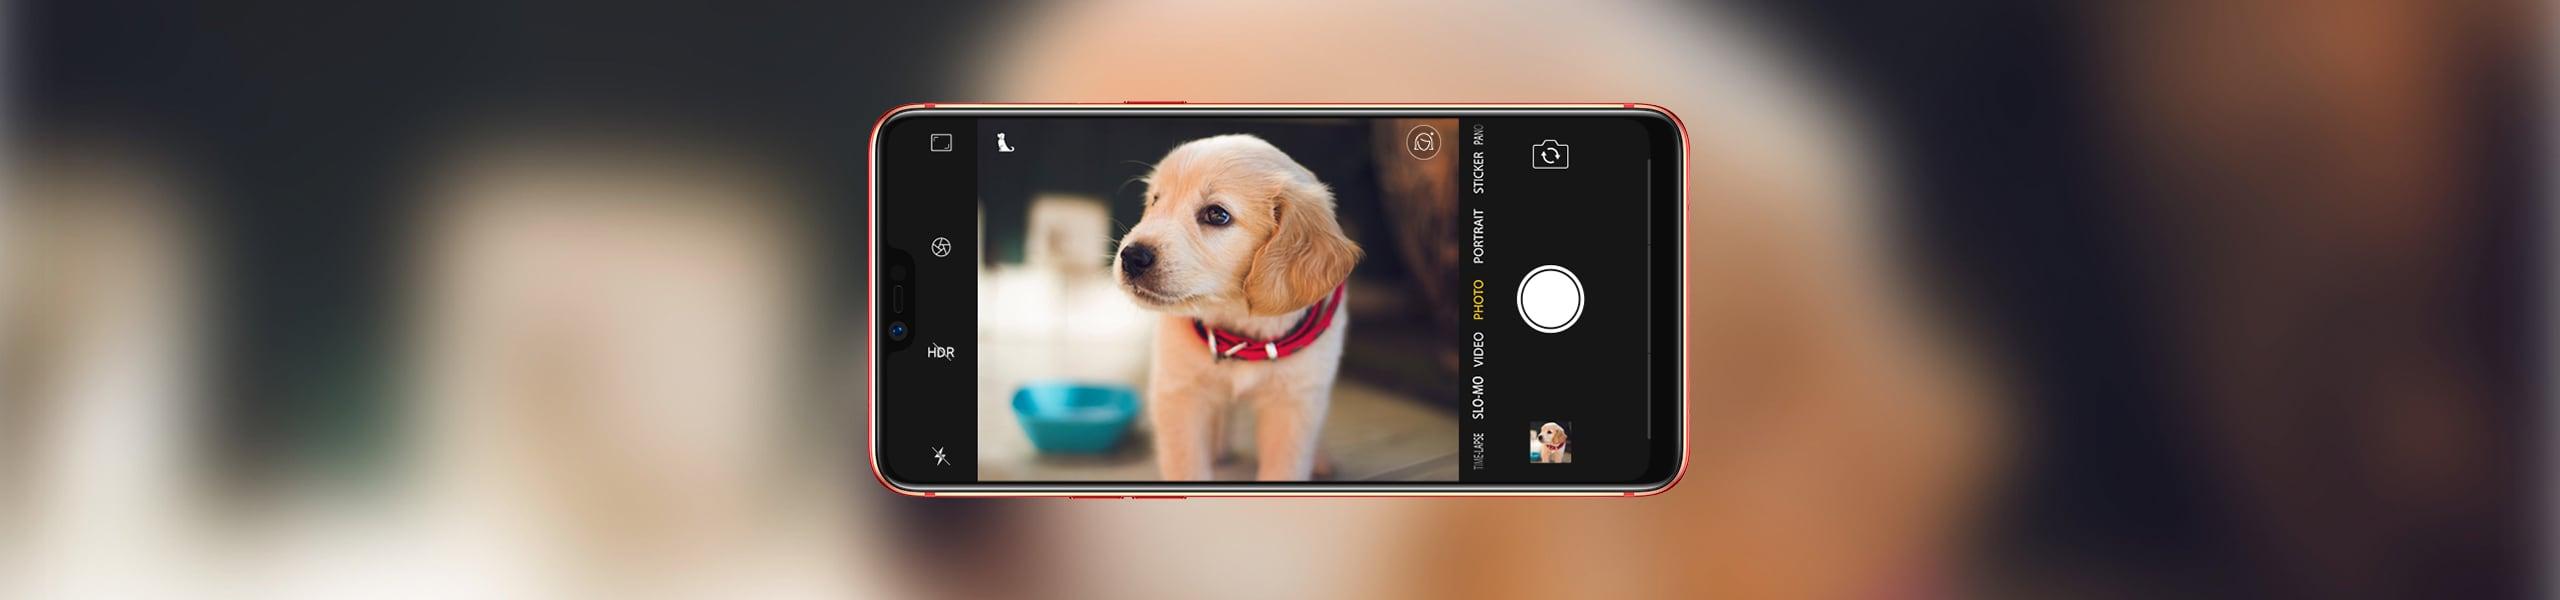 OPPO R15 Pro - AI Enhanced Camera Phone - OPPO Malaysia